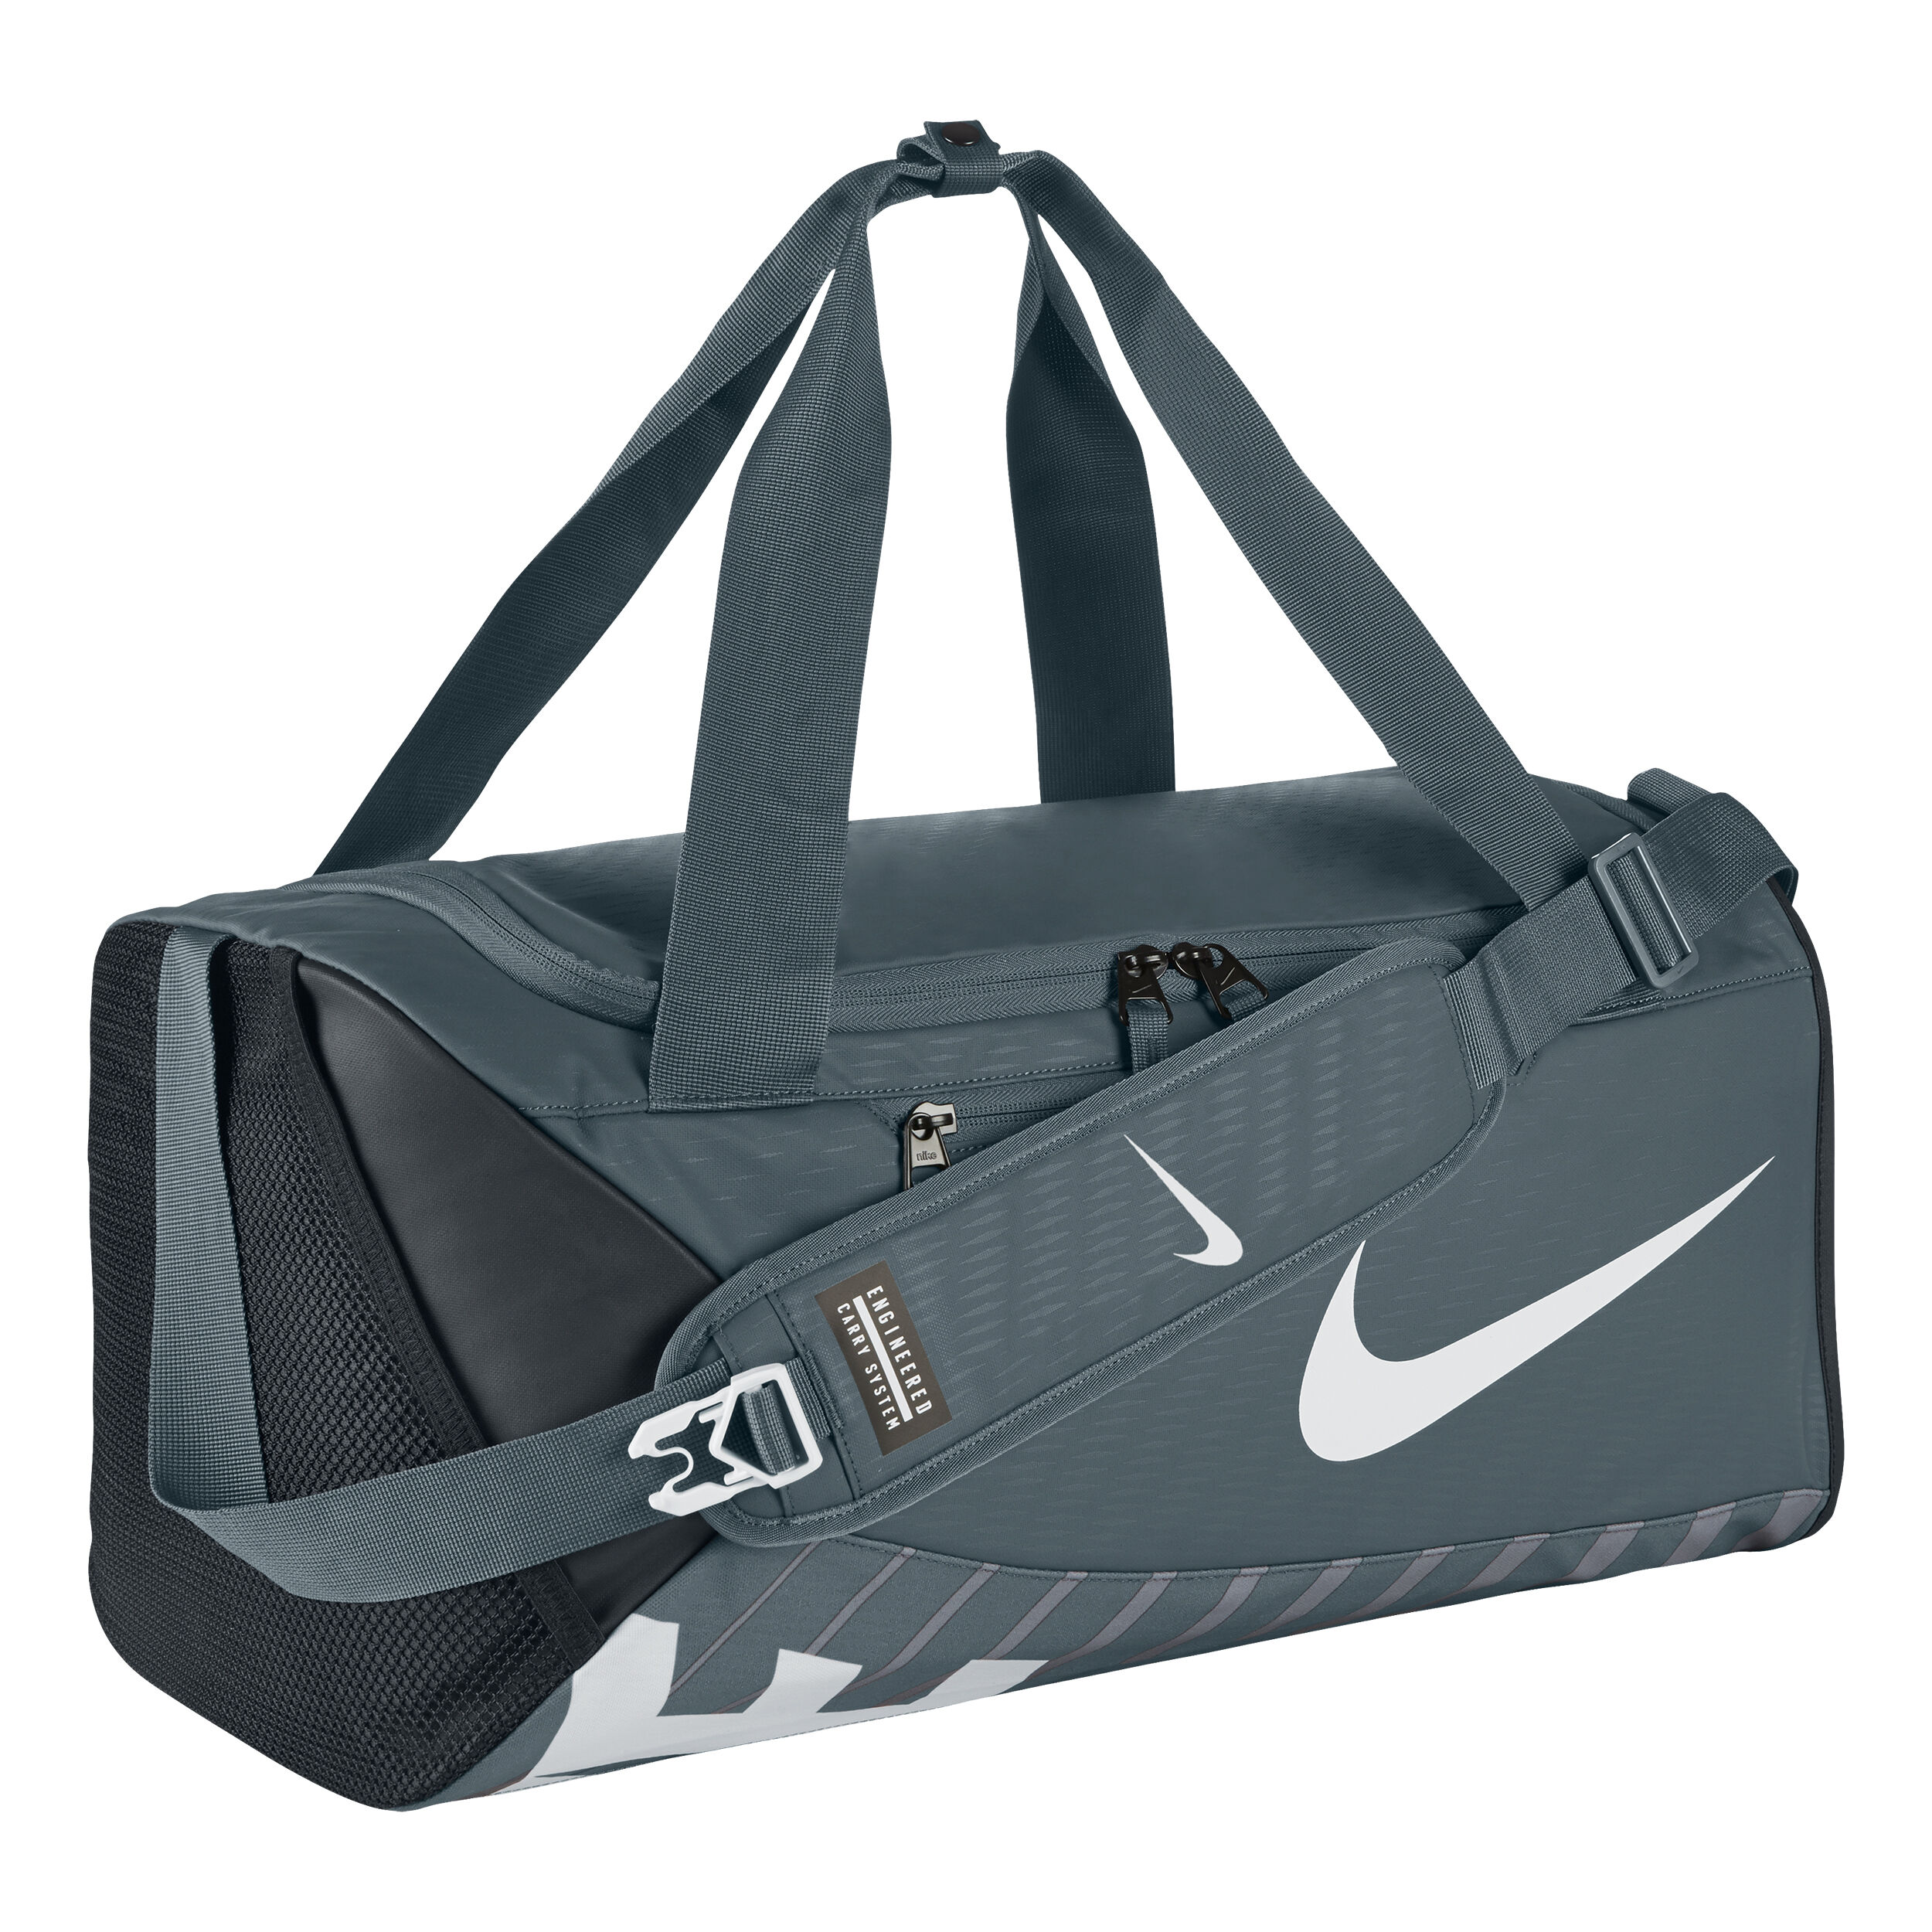 Adapt Crossbody Pequeño Bolsa Deporte GrisNegro Nike Alpha Duffel 54RjL3Aq